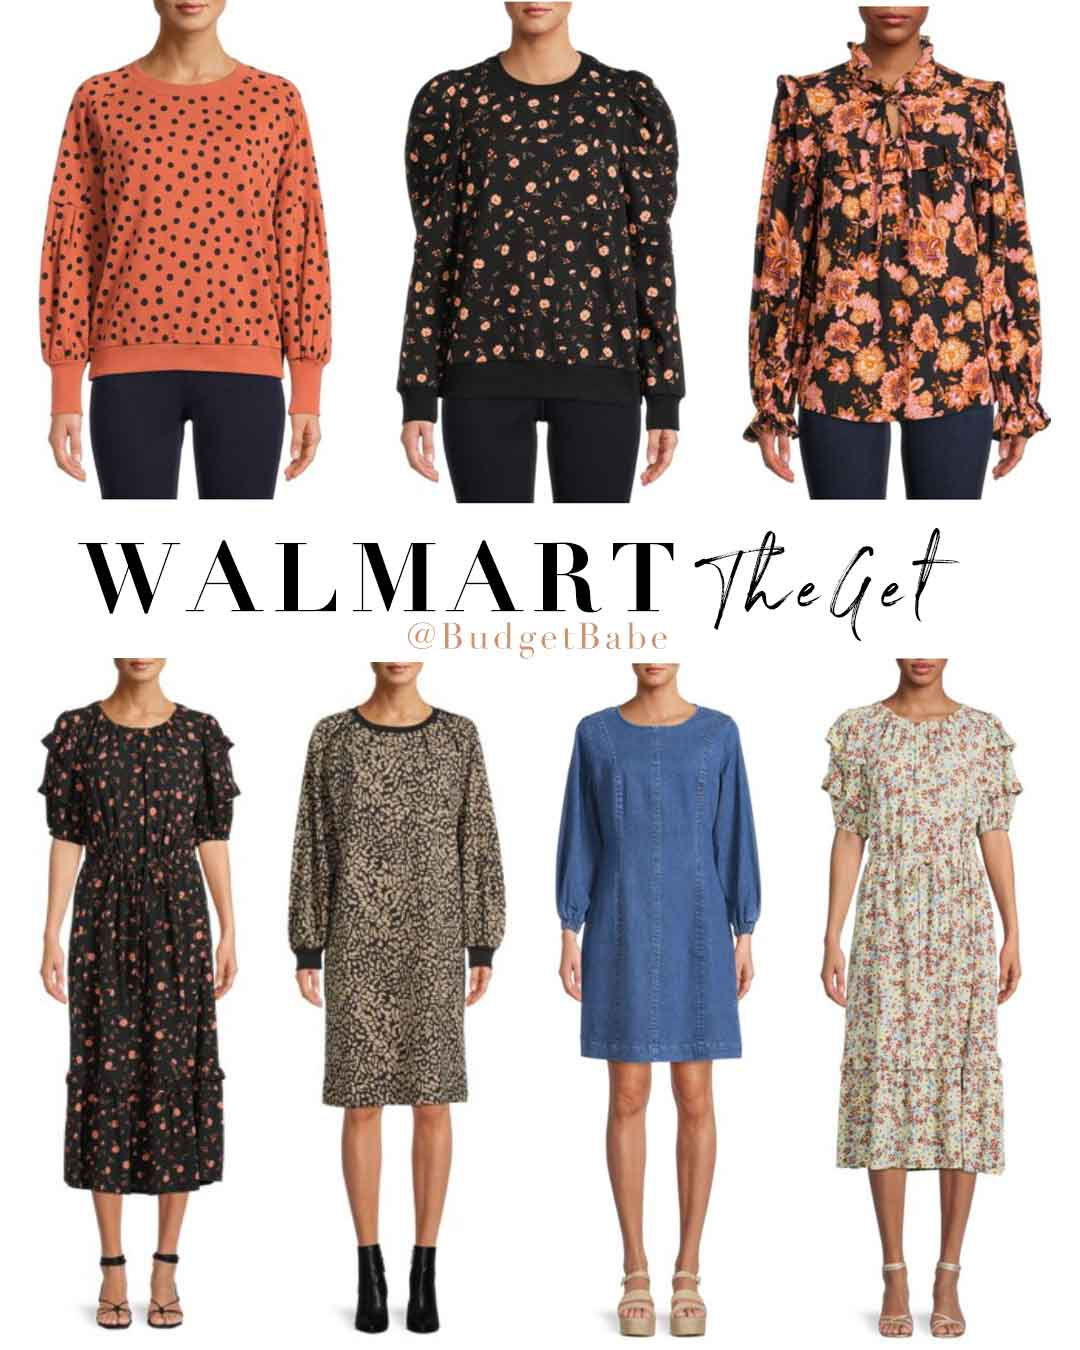 Walmart's new fashion brand TheGet is boho goodness under $40!